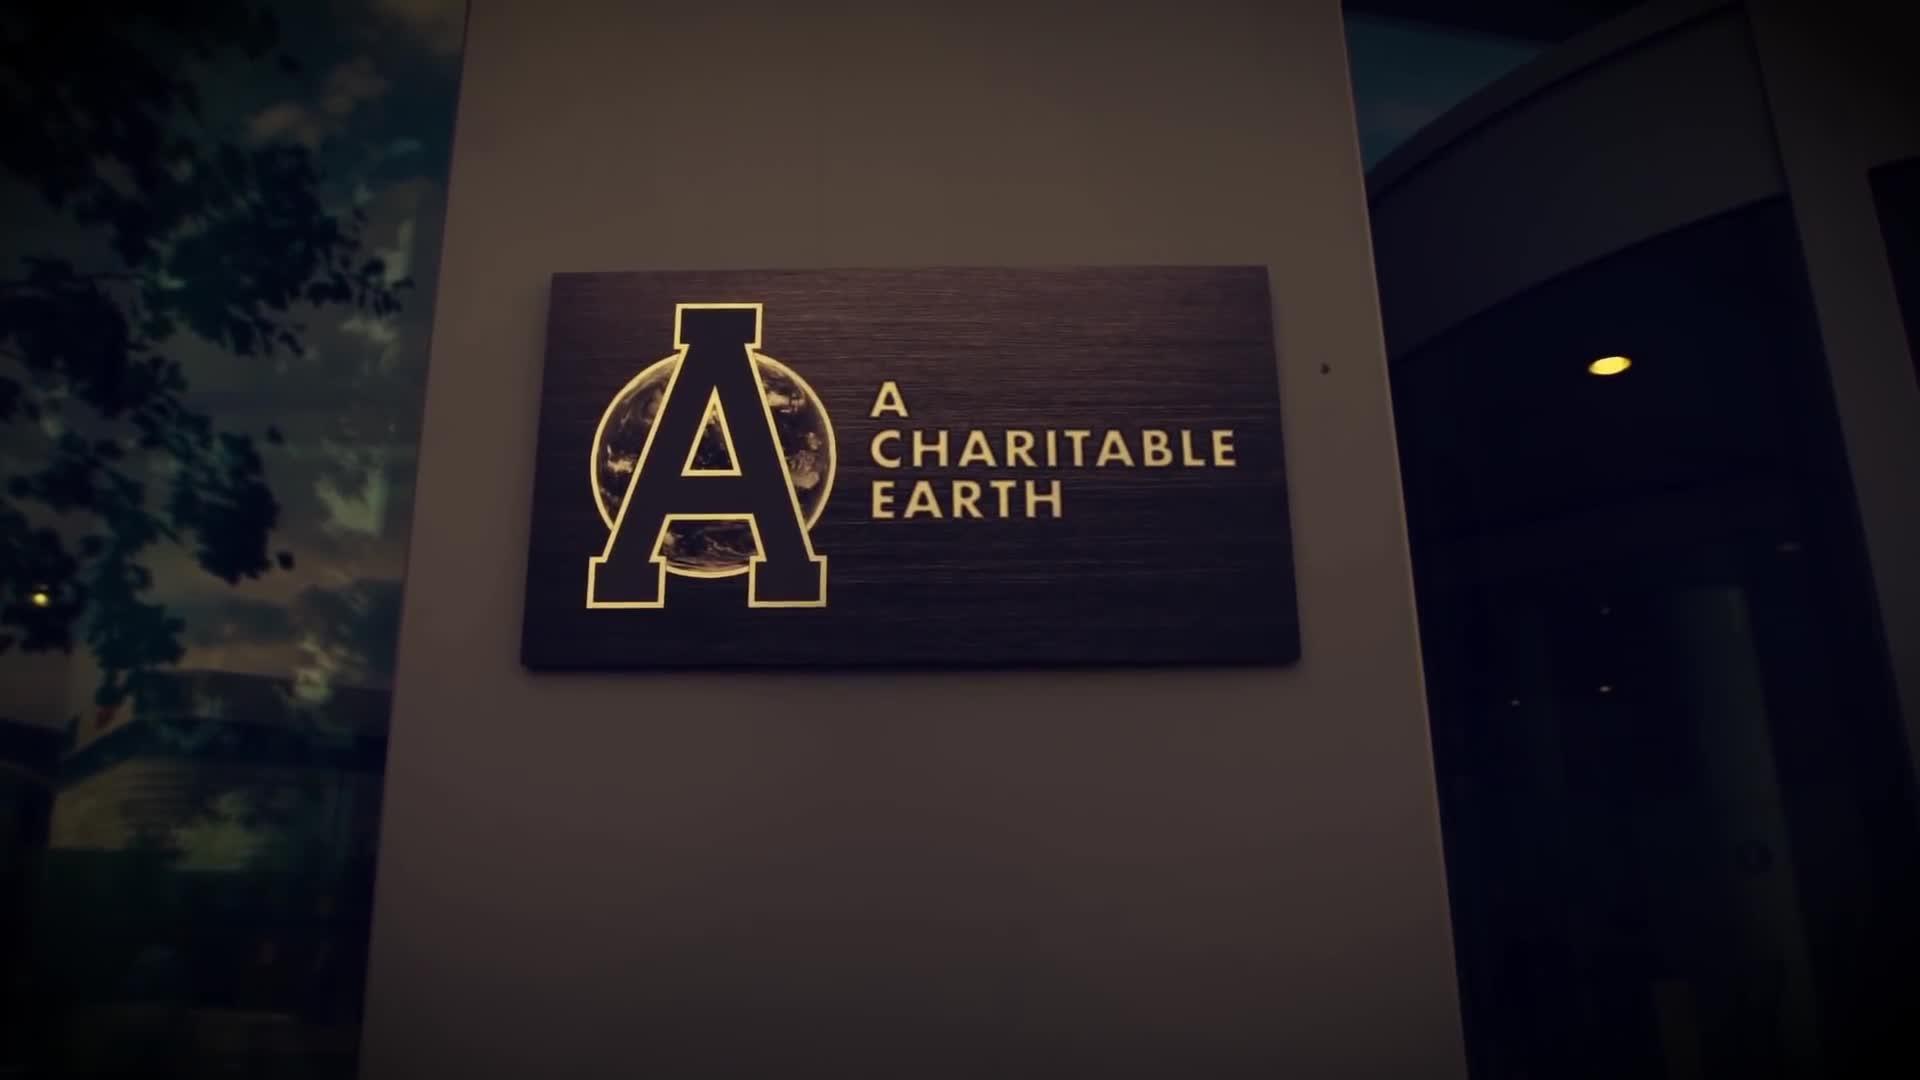 A Charitable Earth